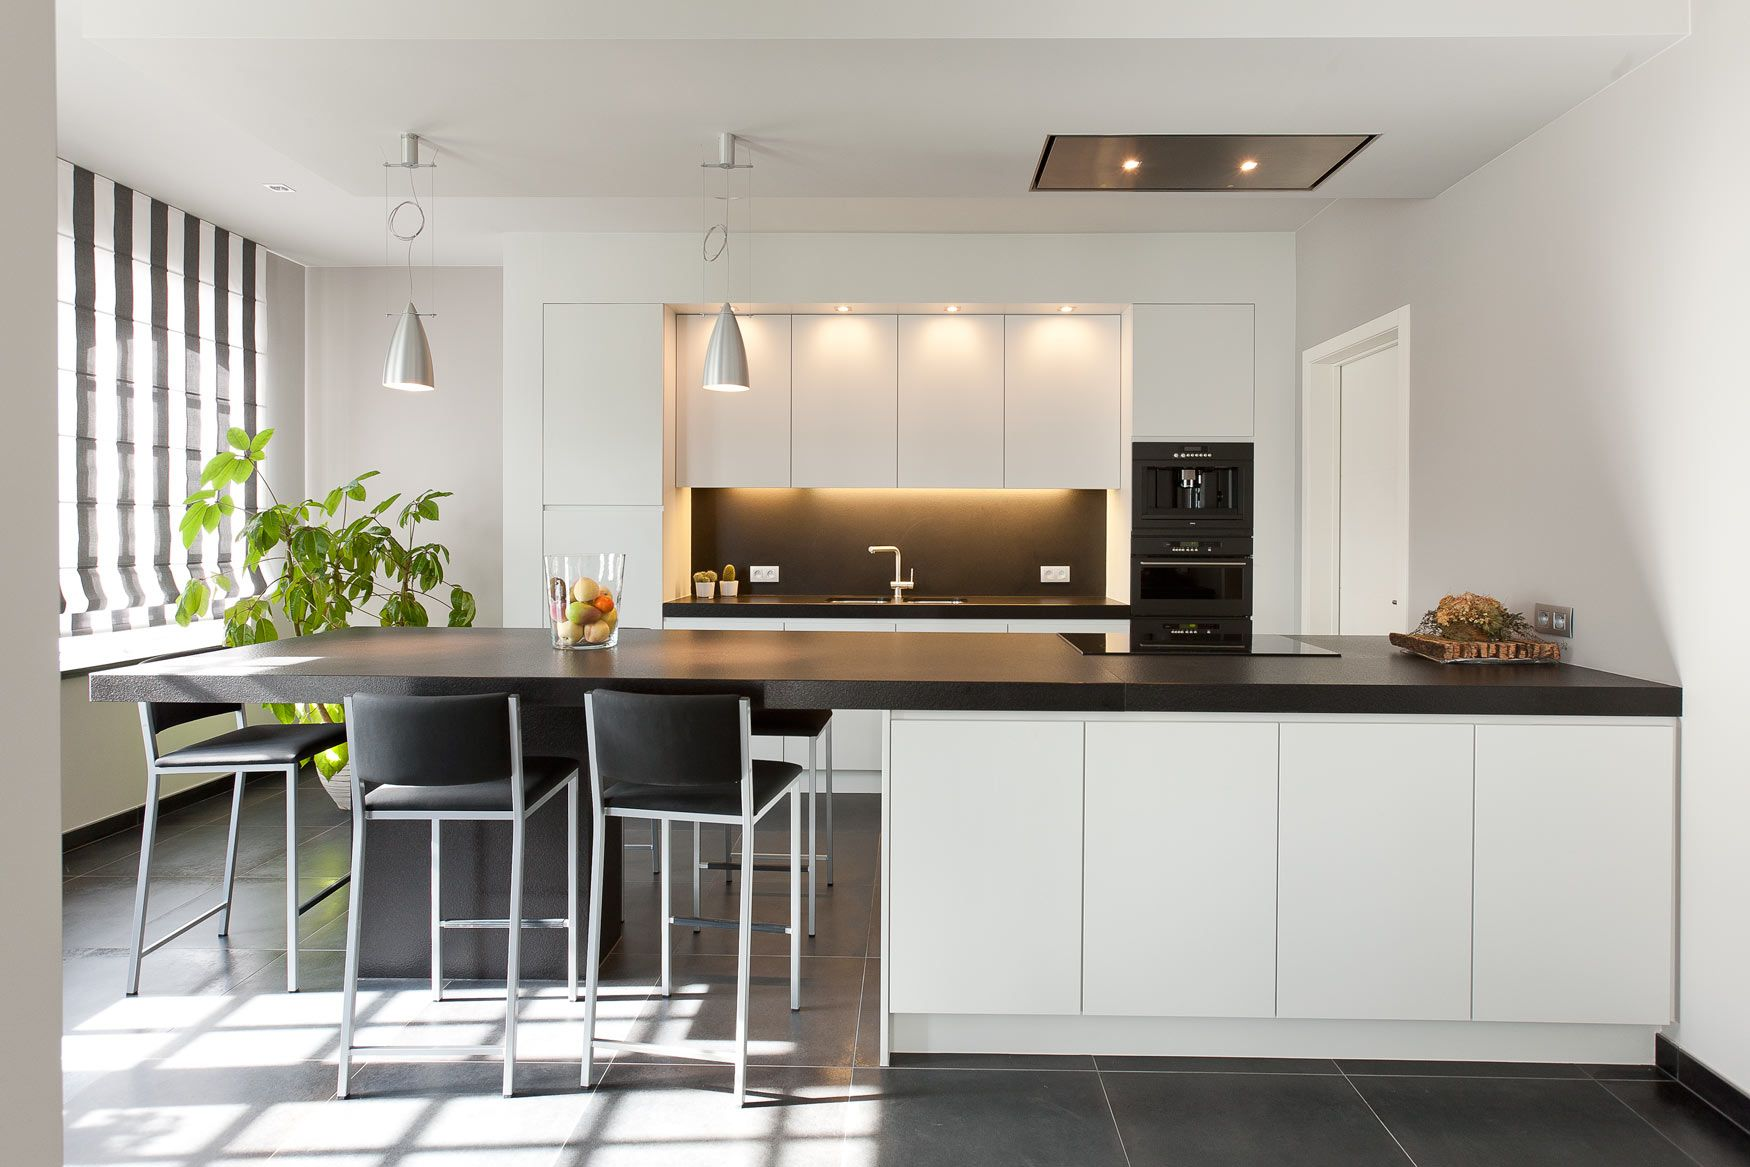 Moderne Keukens Belgie : Moderne keuken simpel zwart en wit int kuchyne